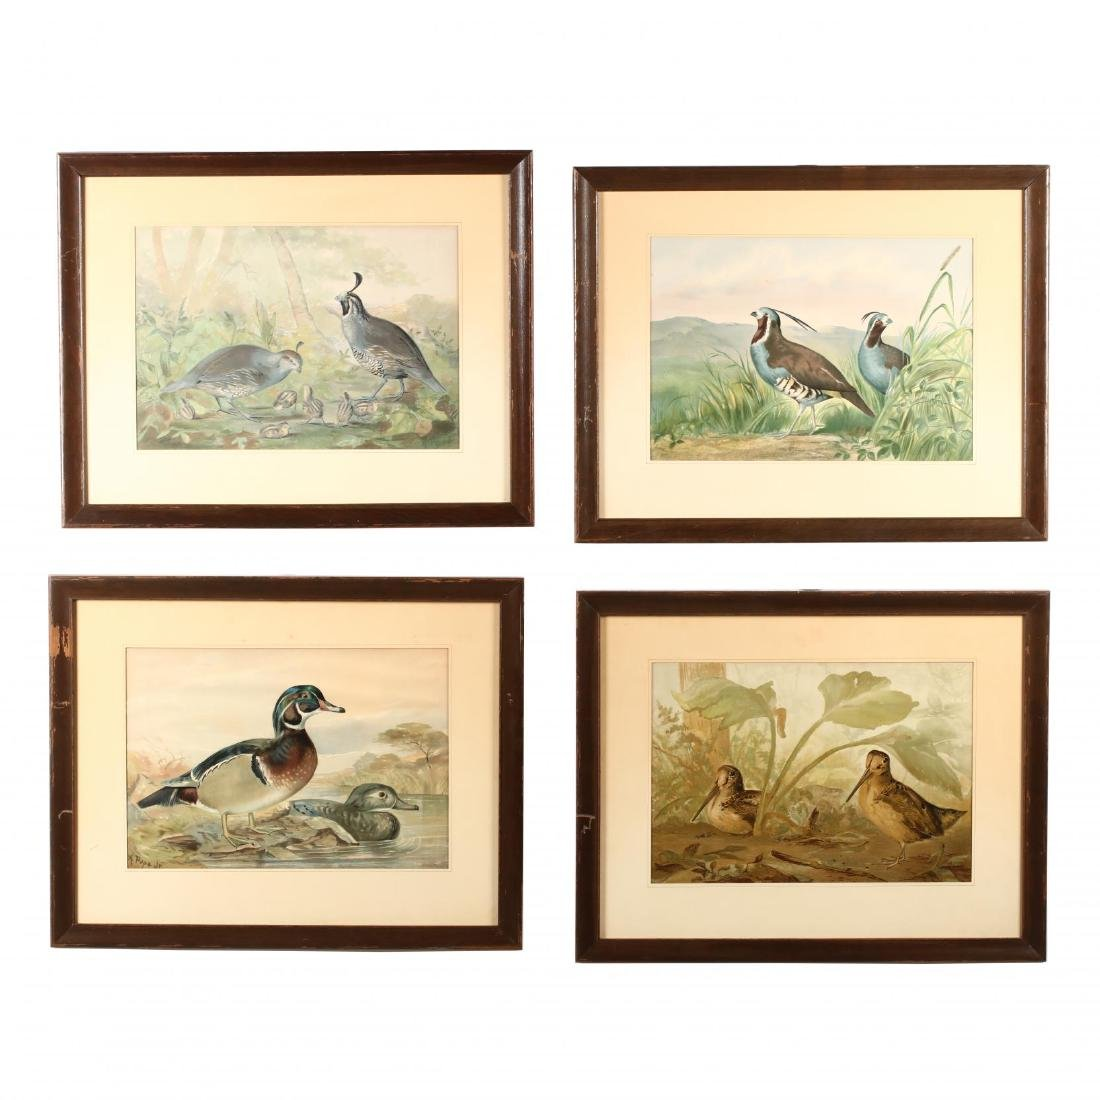 Alexander Pope Jr. (American, 1849-1924), Four Works